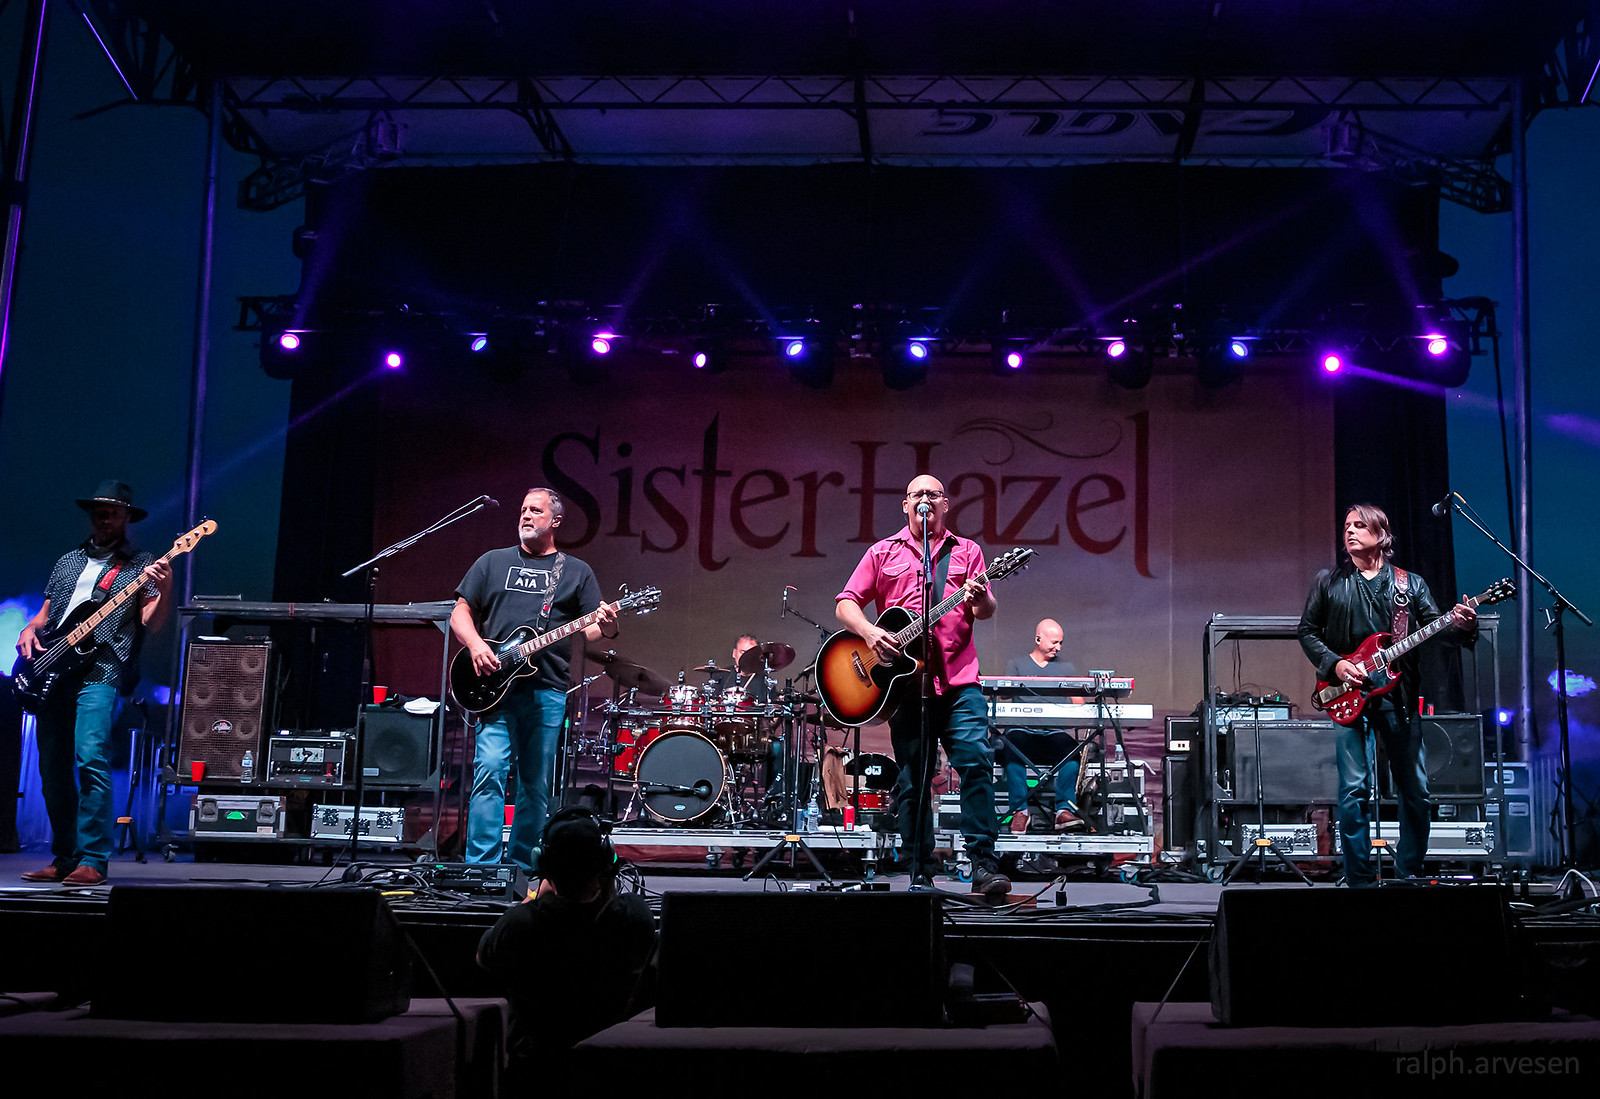 Sister Hazel | Texas Review | Ralph Arvesen